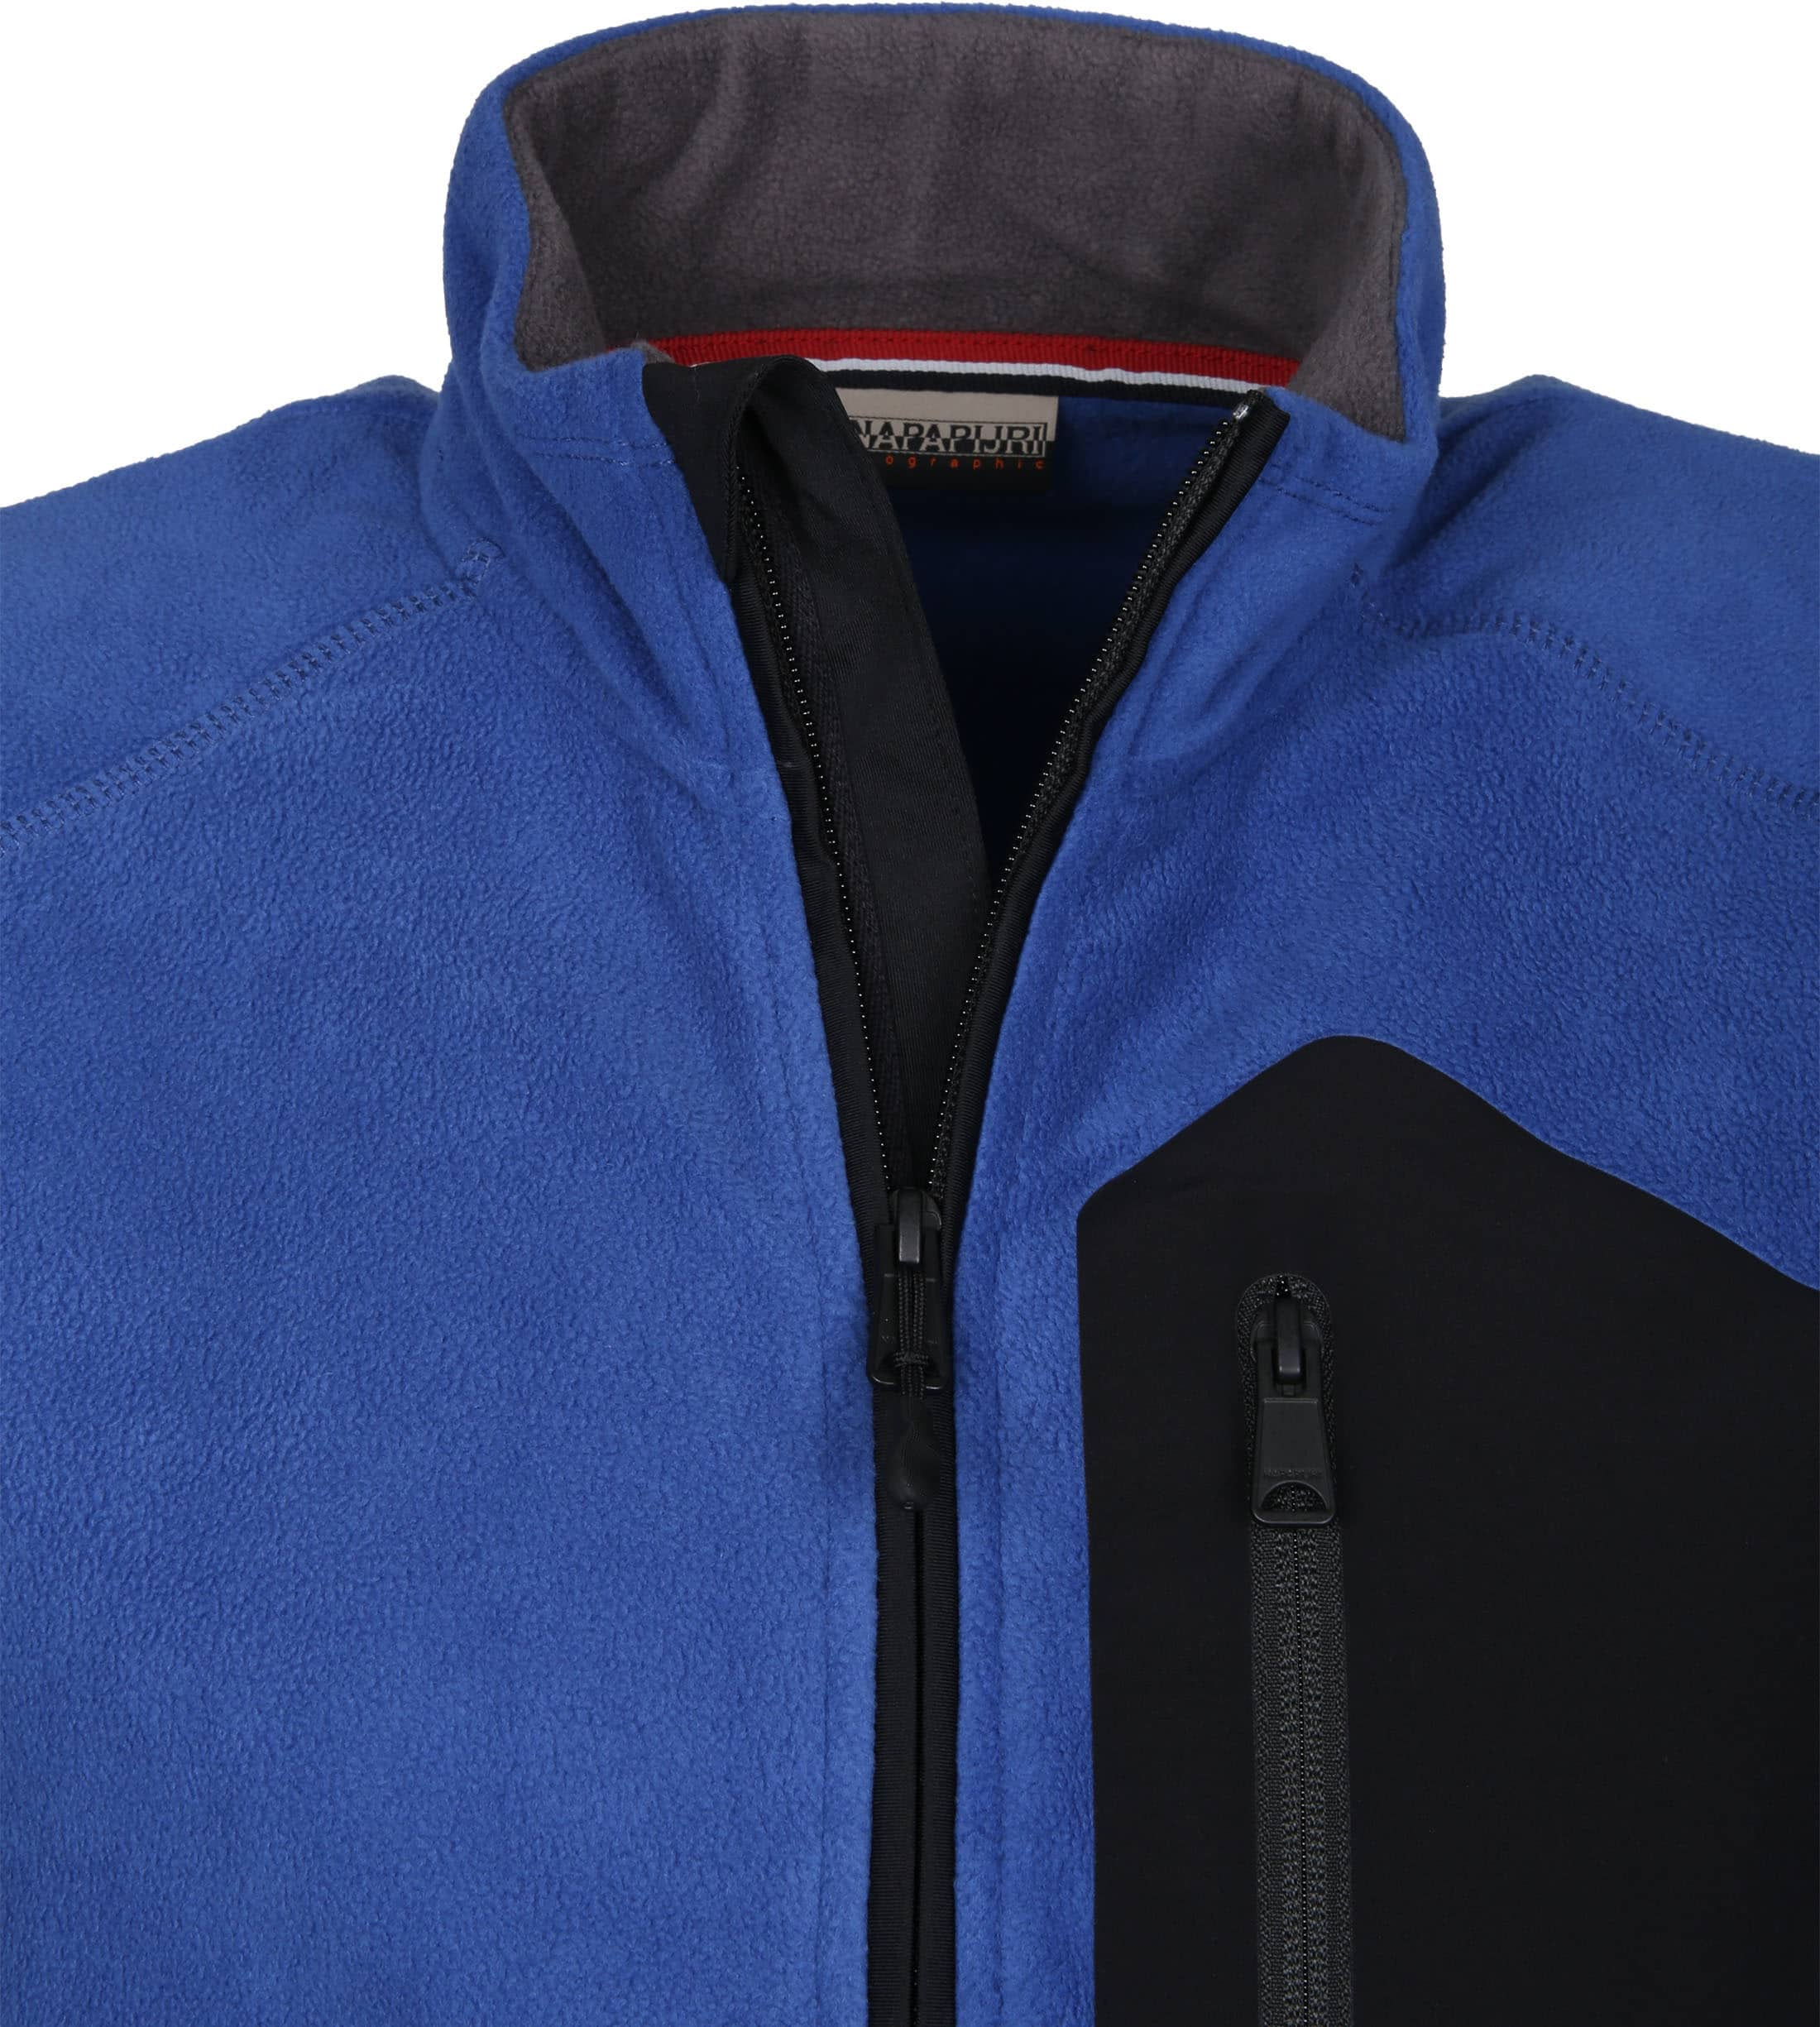 Napapijri Fleece Vest Tambo Kobalt foto 1